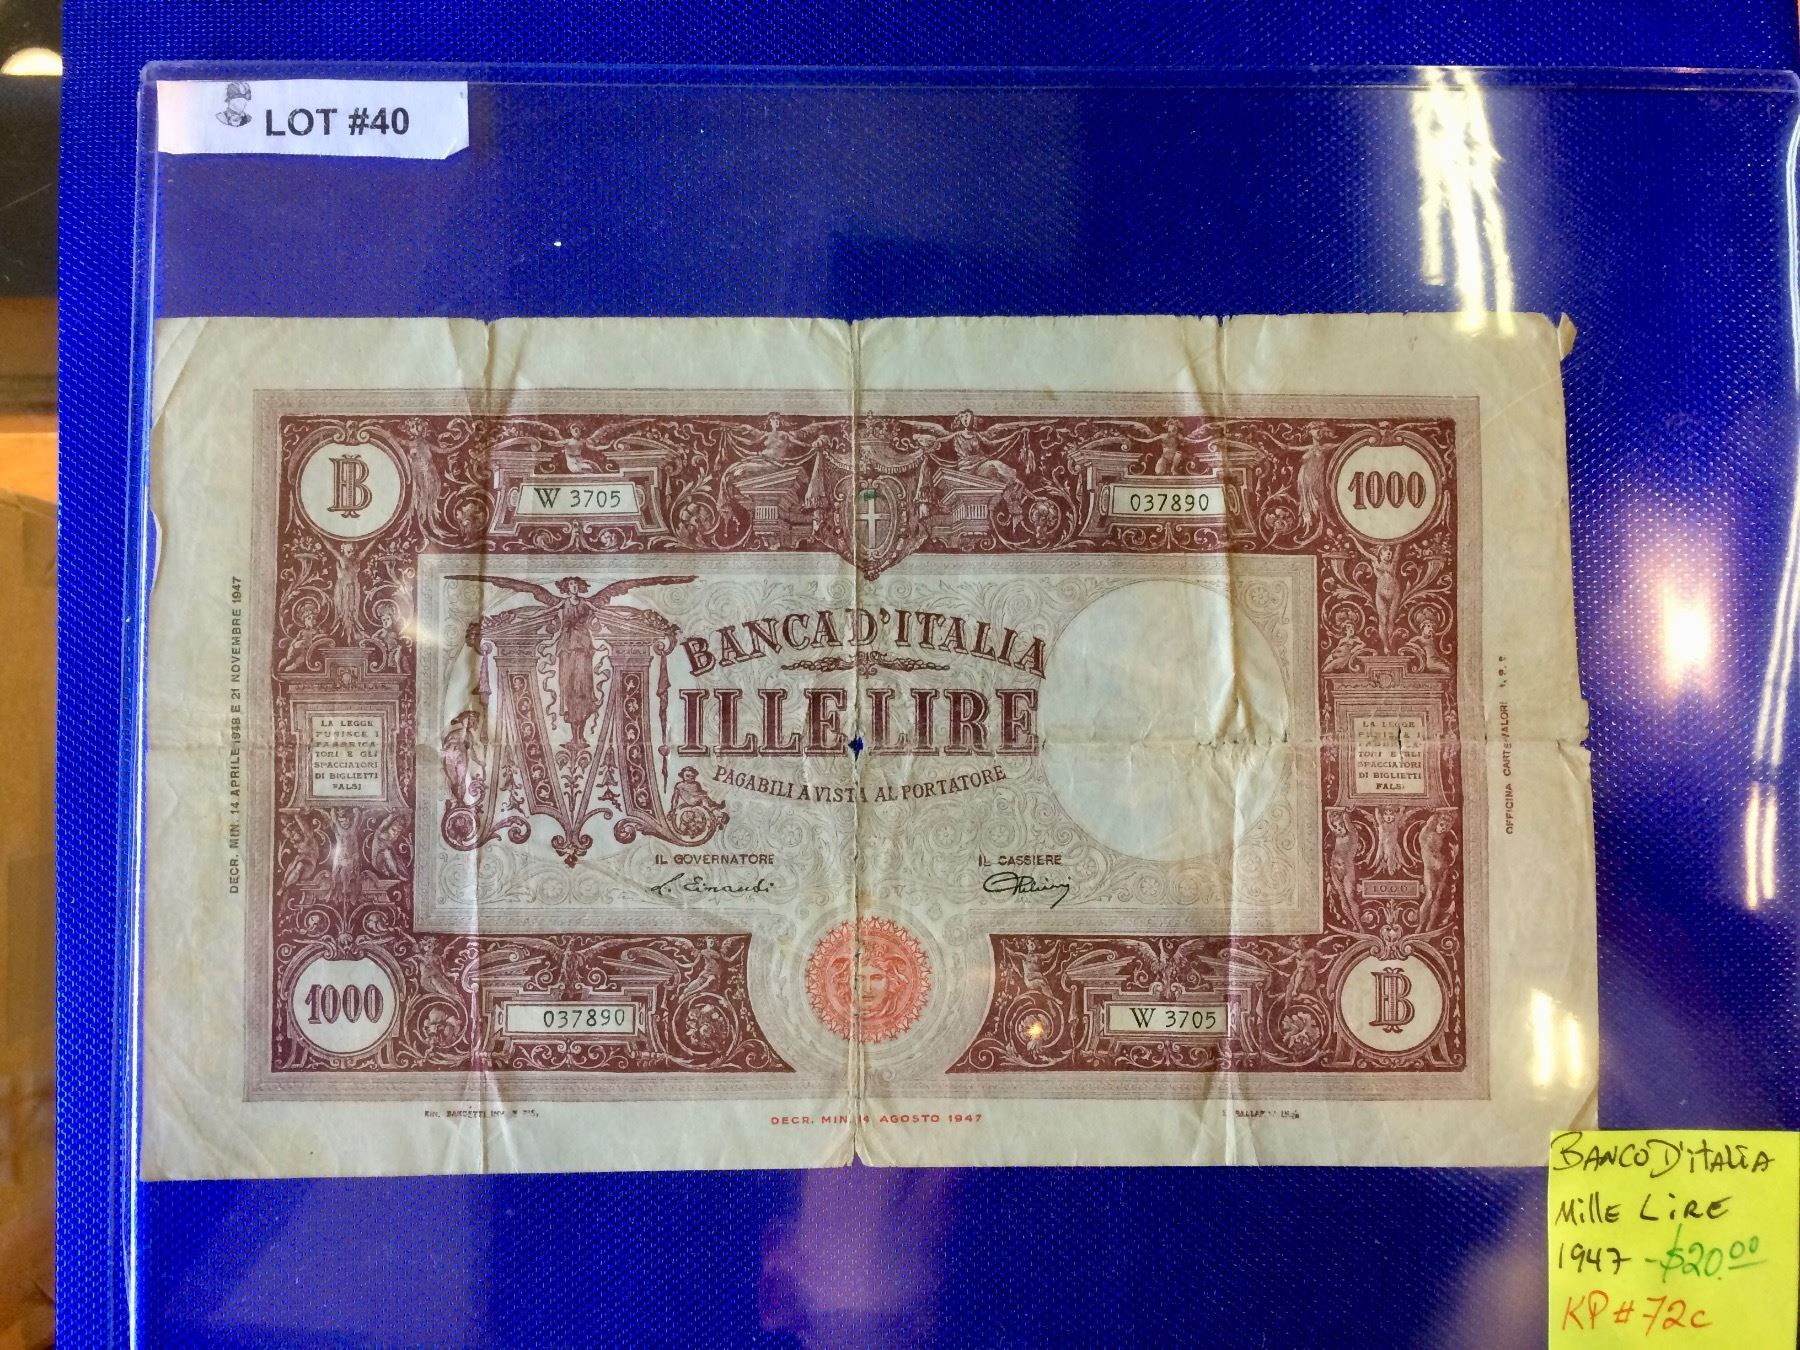 Banca Ditalia Mille Lire 1947 Kp72c